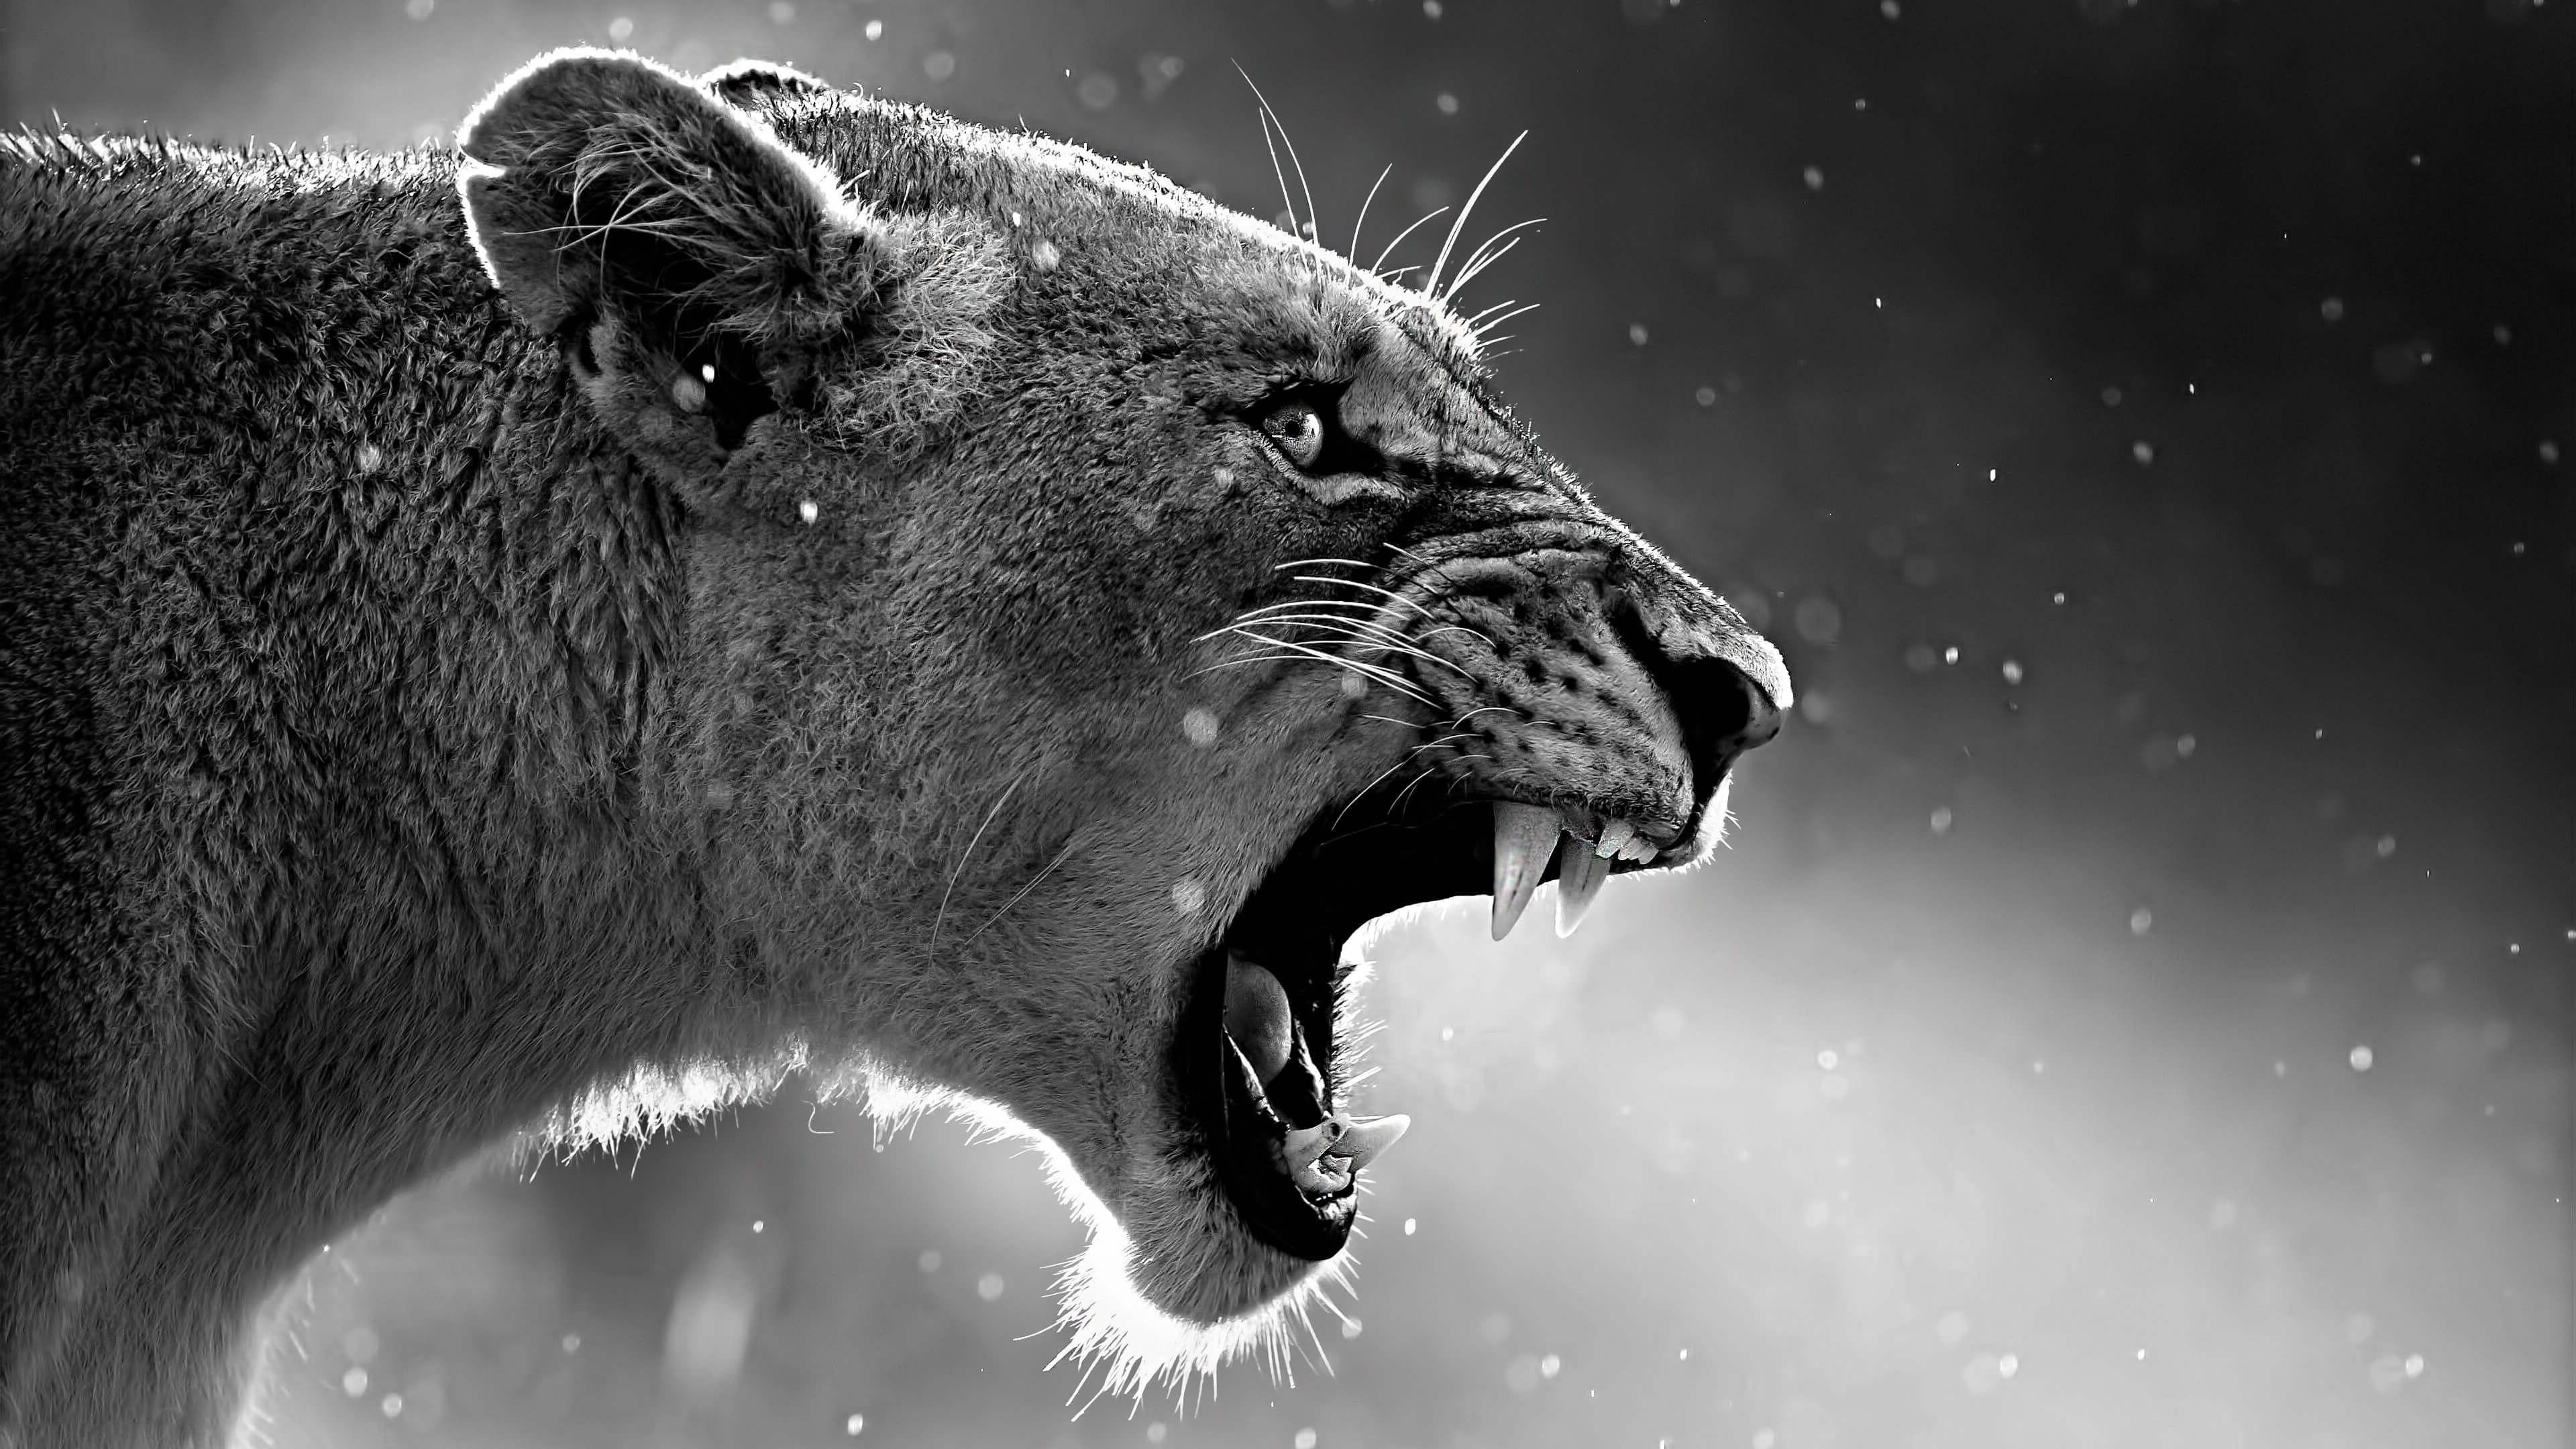 Lion Wallpaper Desktop 68 Images